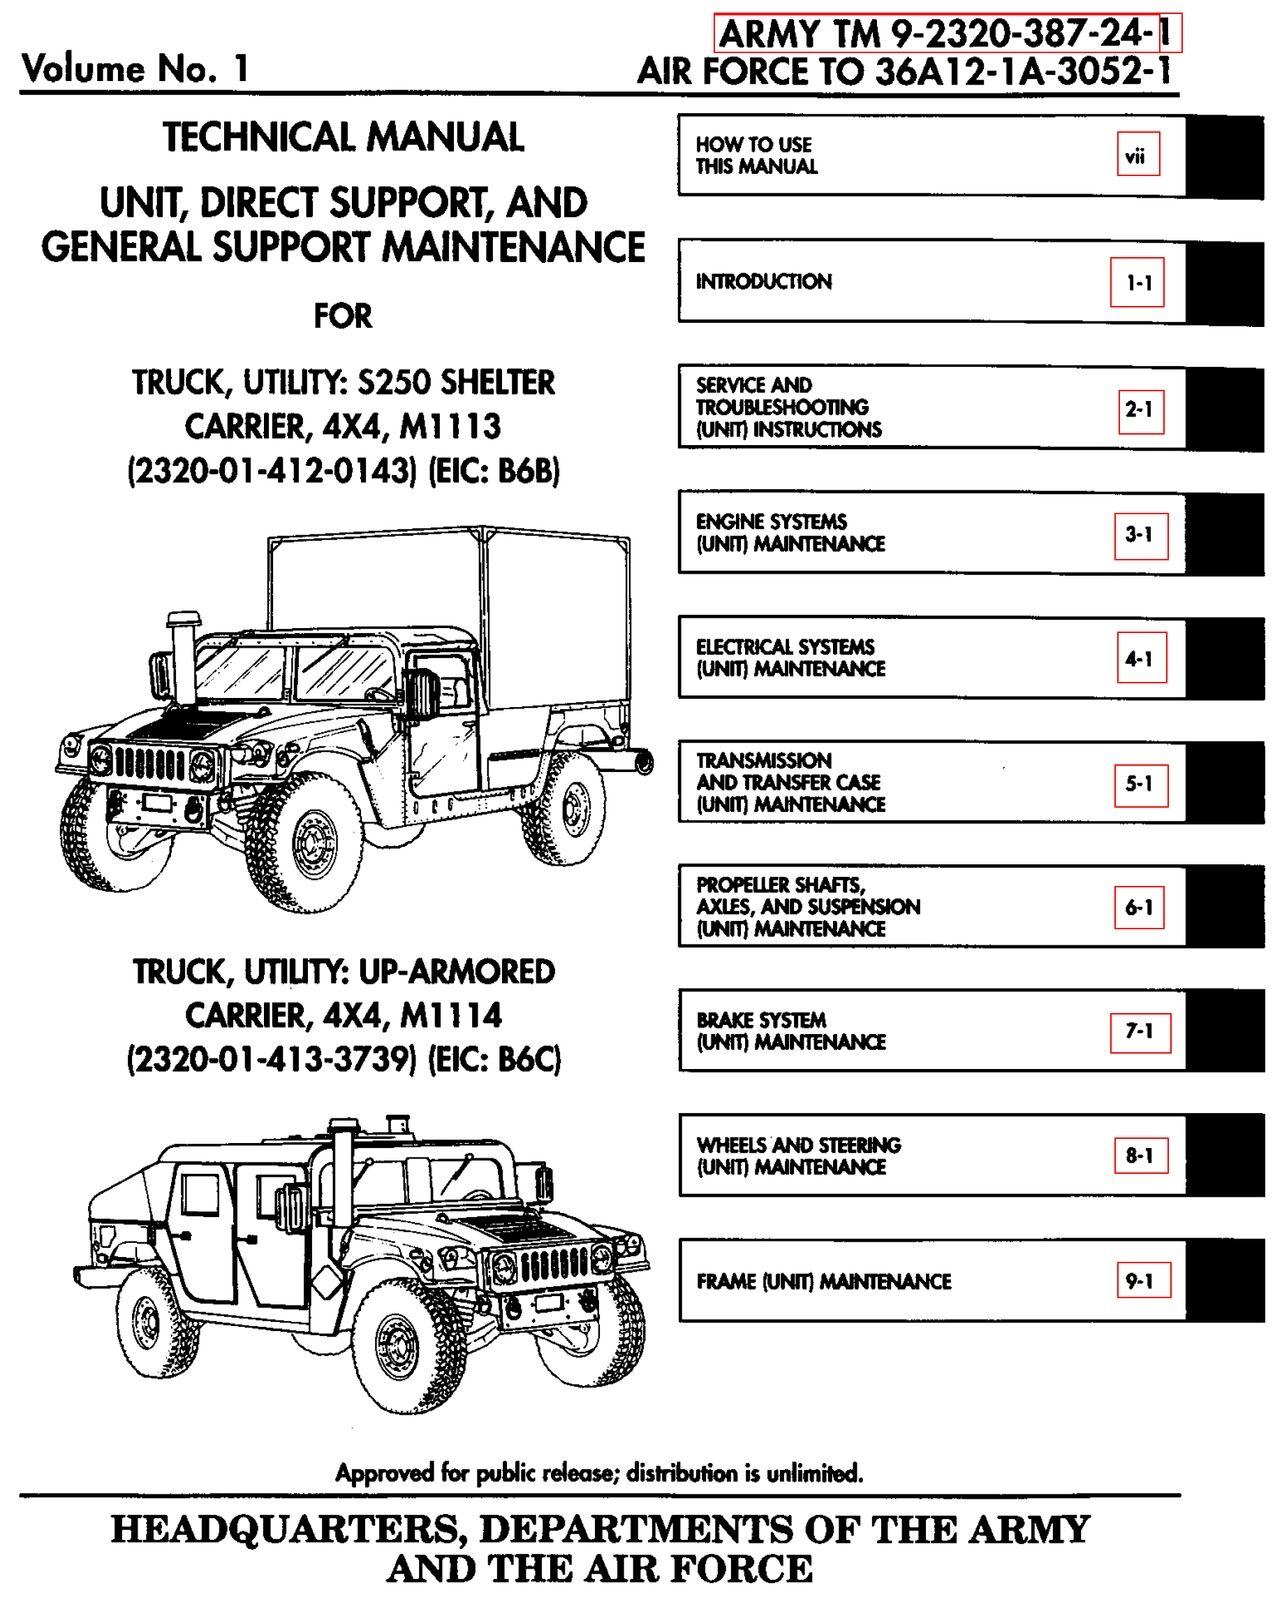 11 500 page m998 army hmmwv hummer humvee repair operator parts rh ebay com m1097 parts manual 24p M1097R1